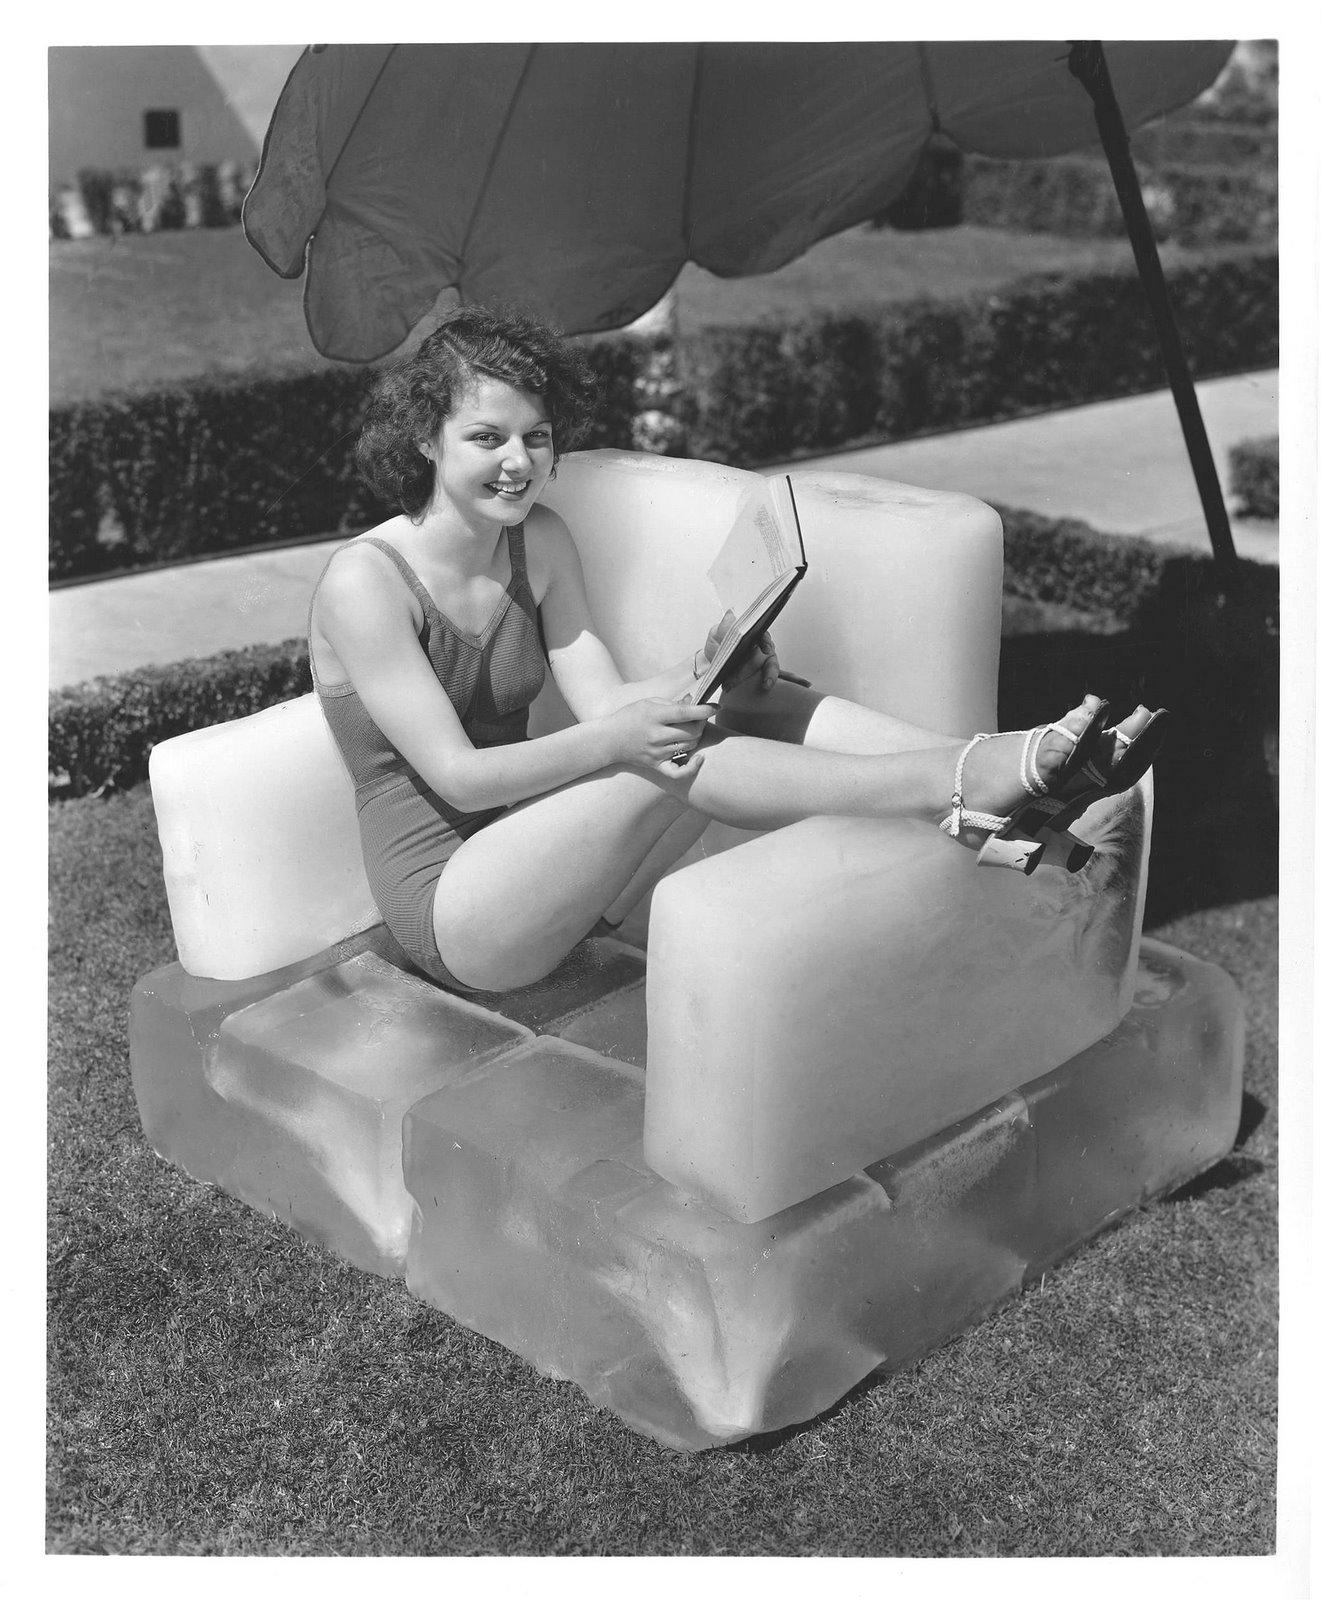 Poppy Drayton (born 1991) images